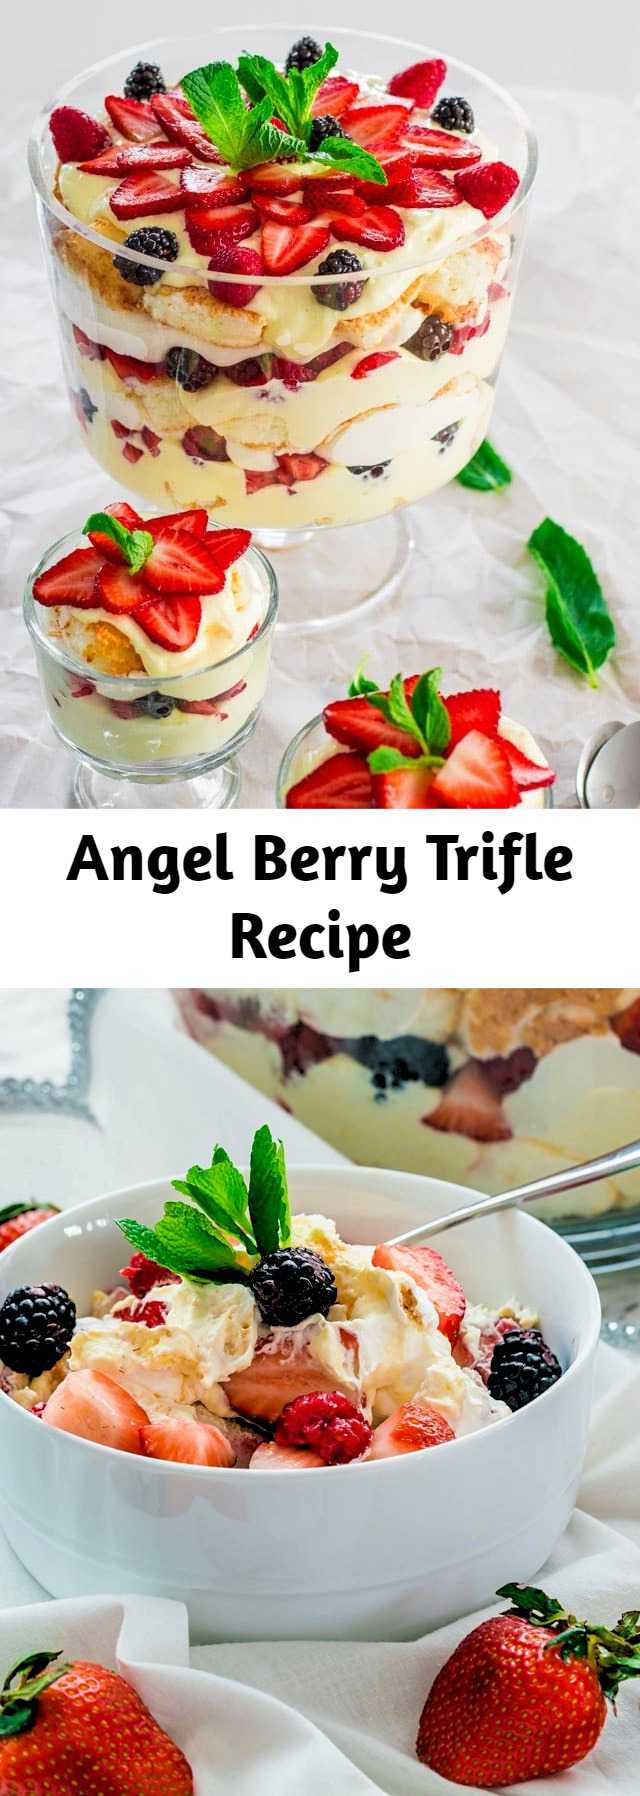 Angel Berry Trifle Recipe